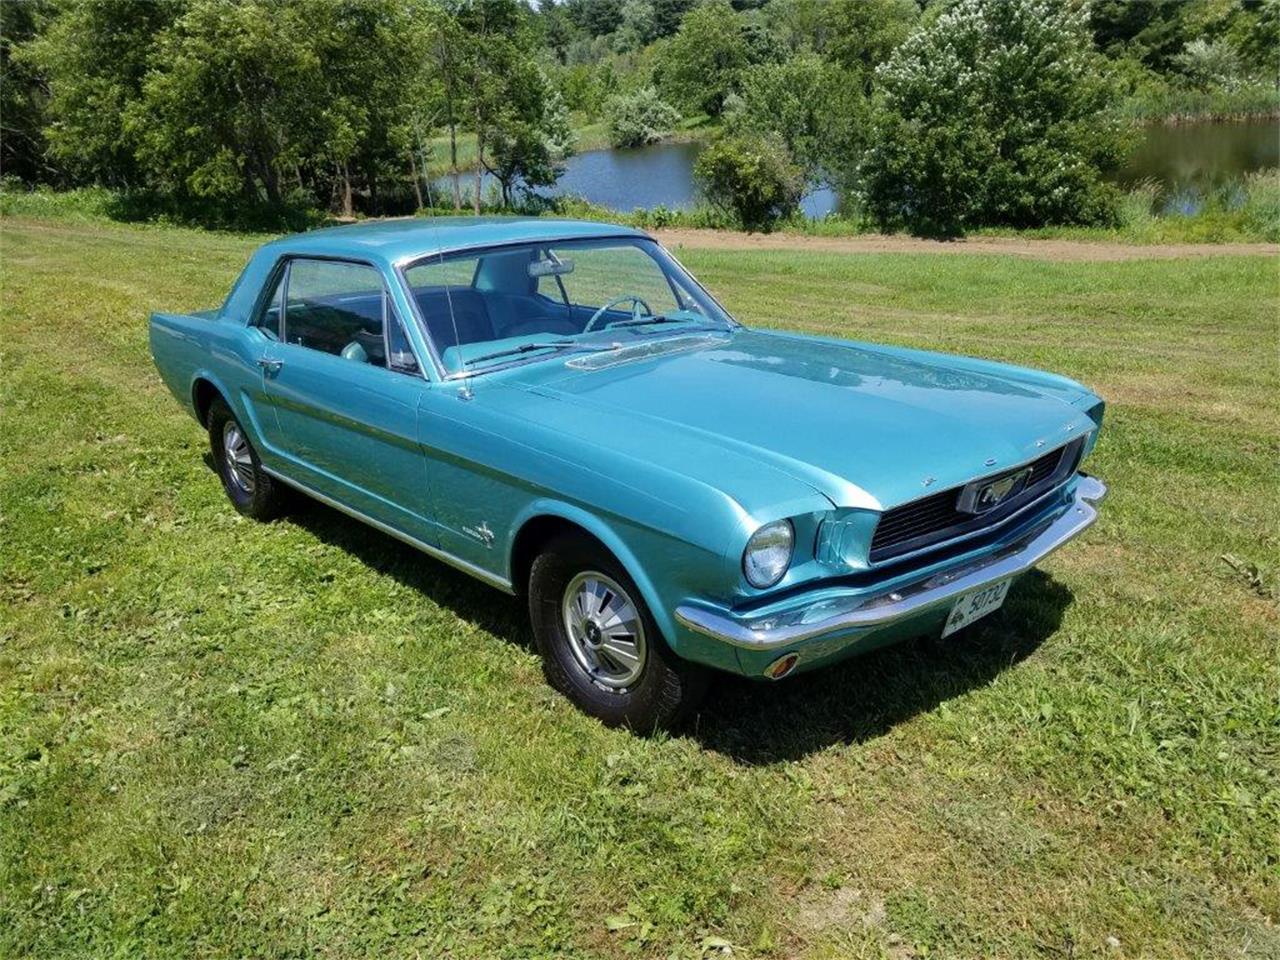 Ford Mustang 1966 prix tout compris